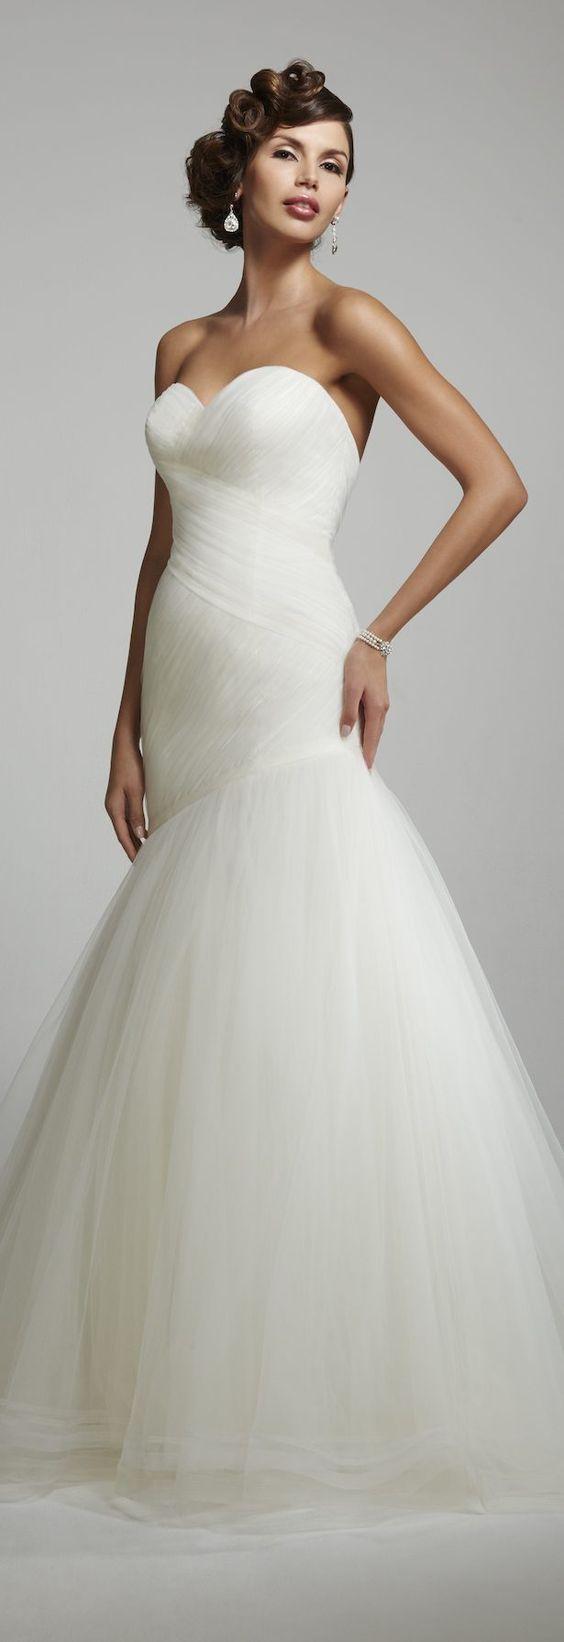 Sleek strapless mermaid style tulle skirt wedding dress; Featured Dress: Matthew Christopher